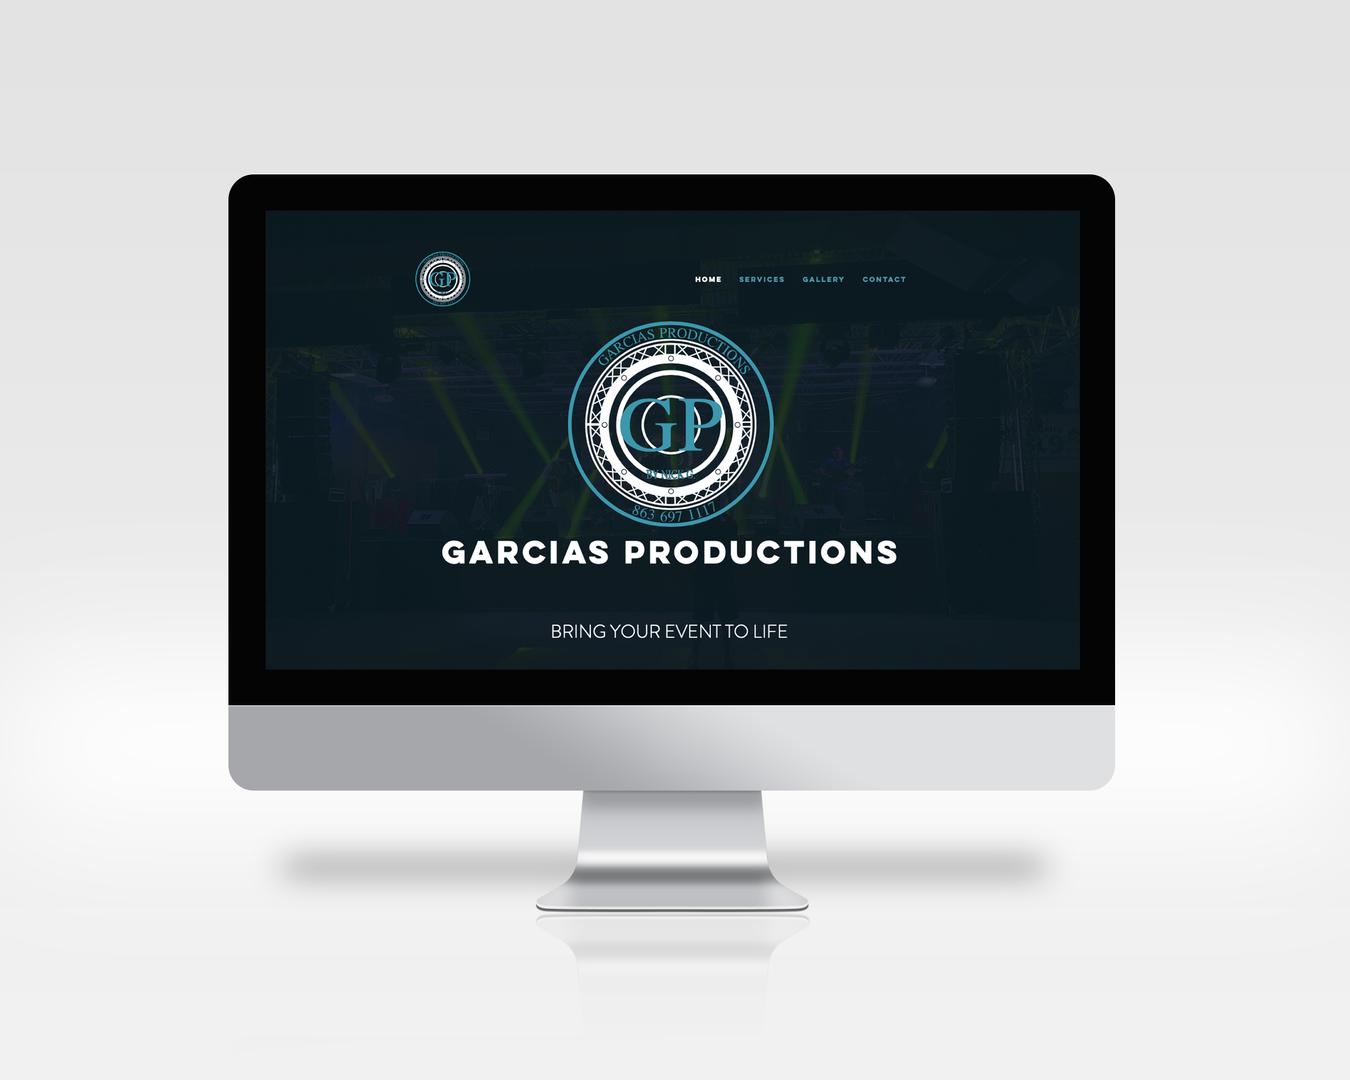 Garcias Productions Computer Mockup